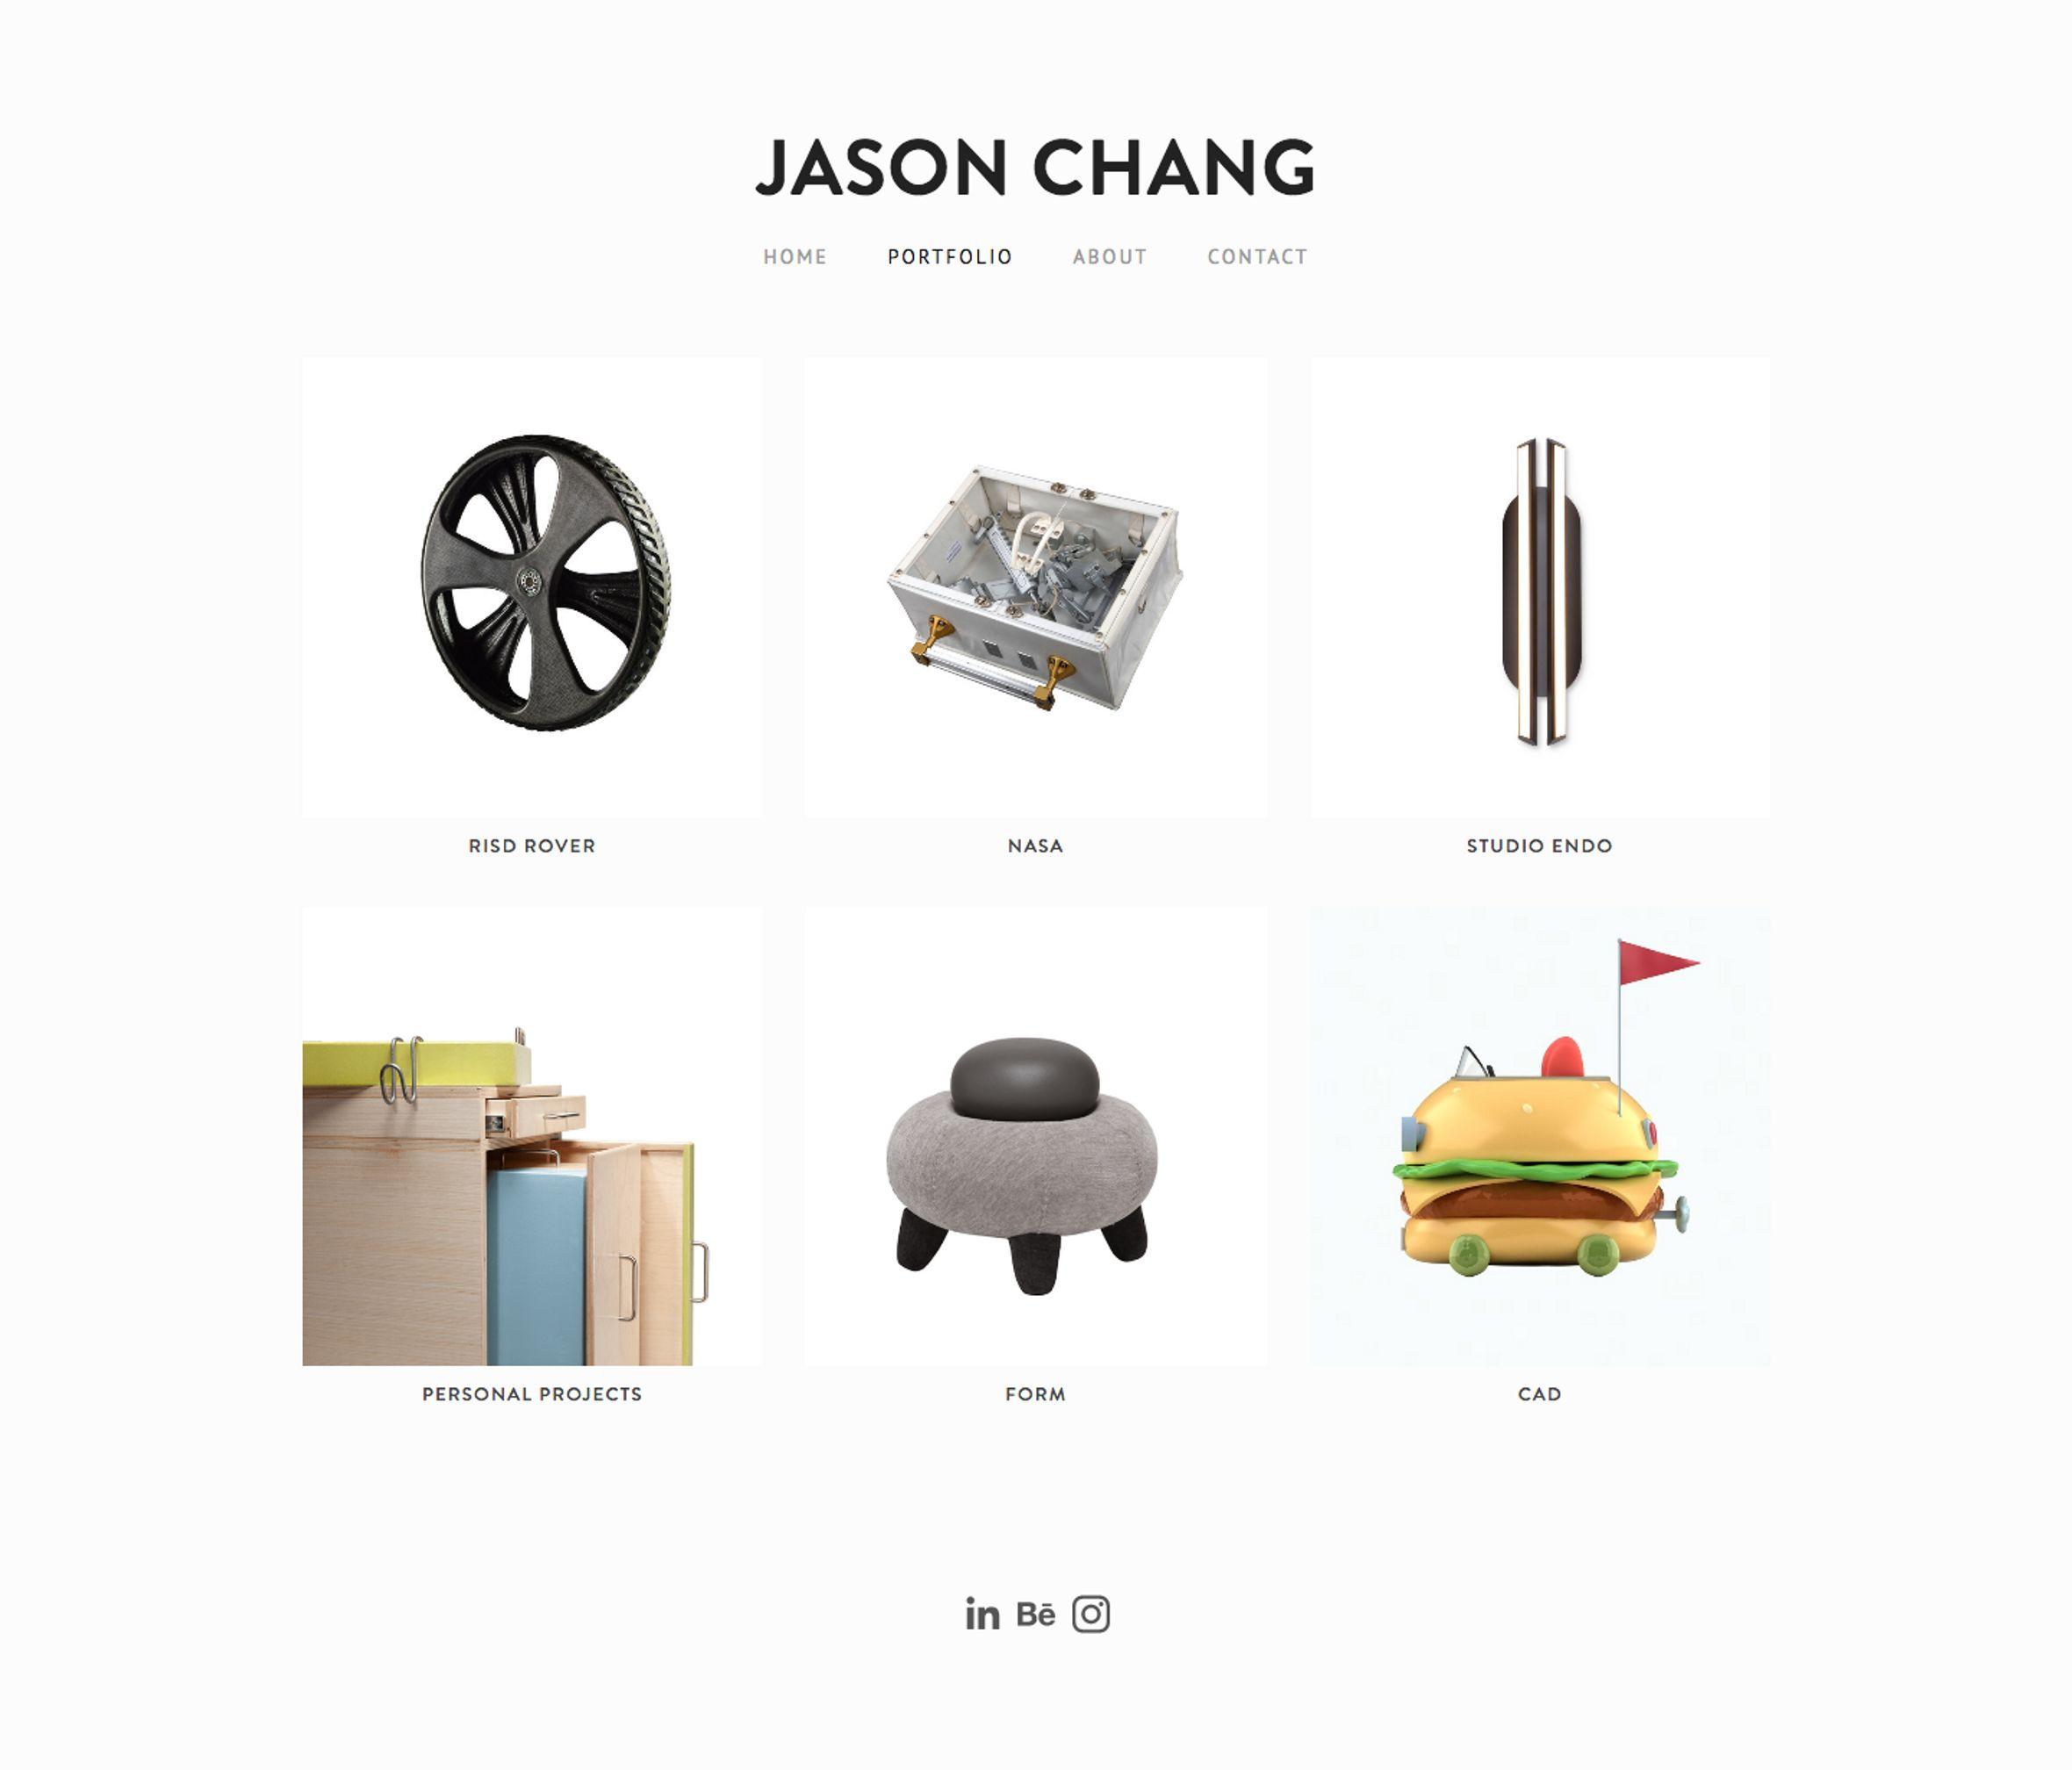 Jason Chang portfolio